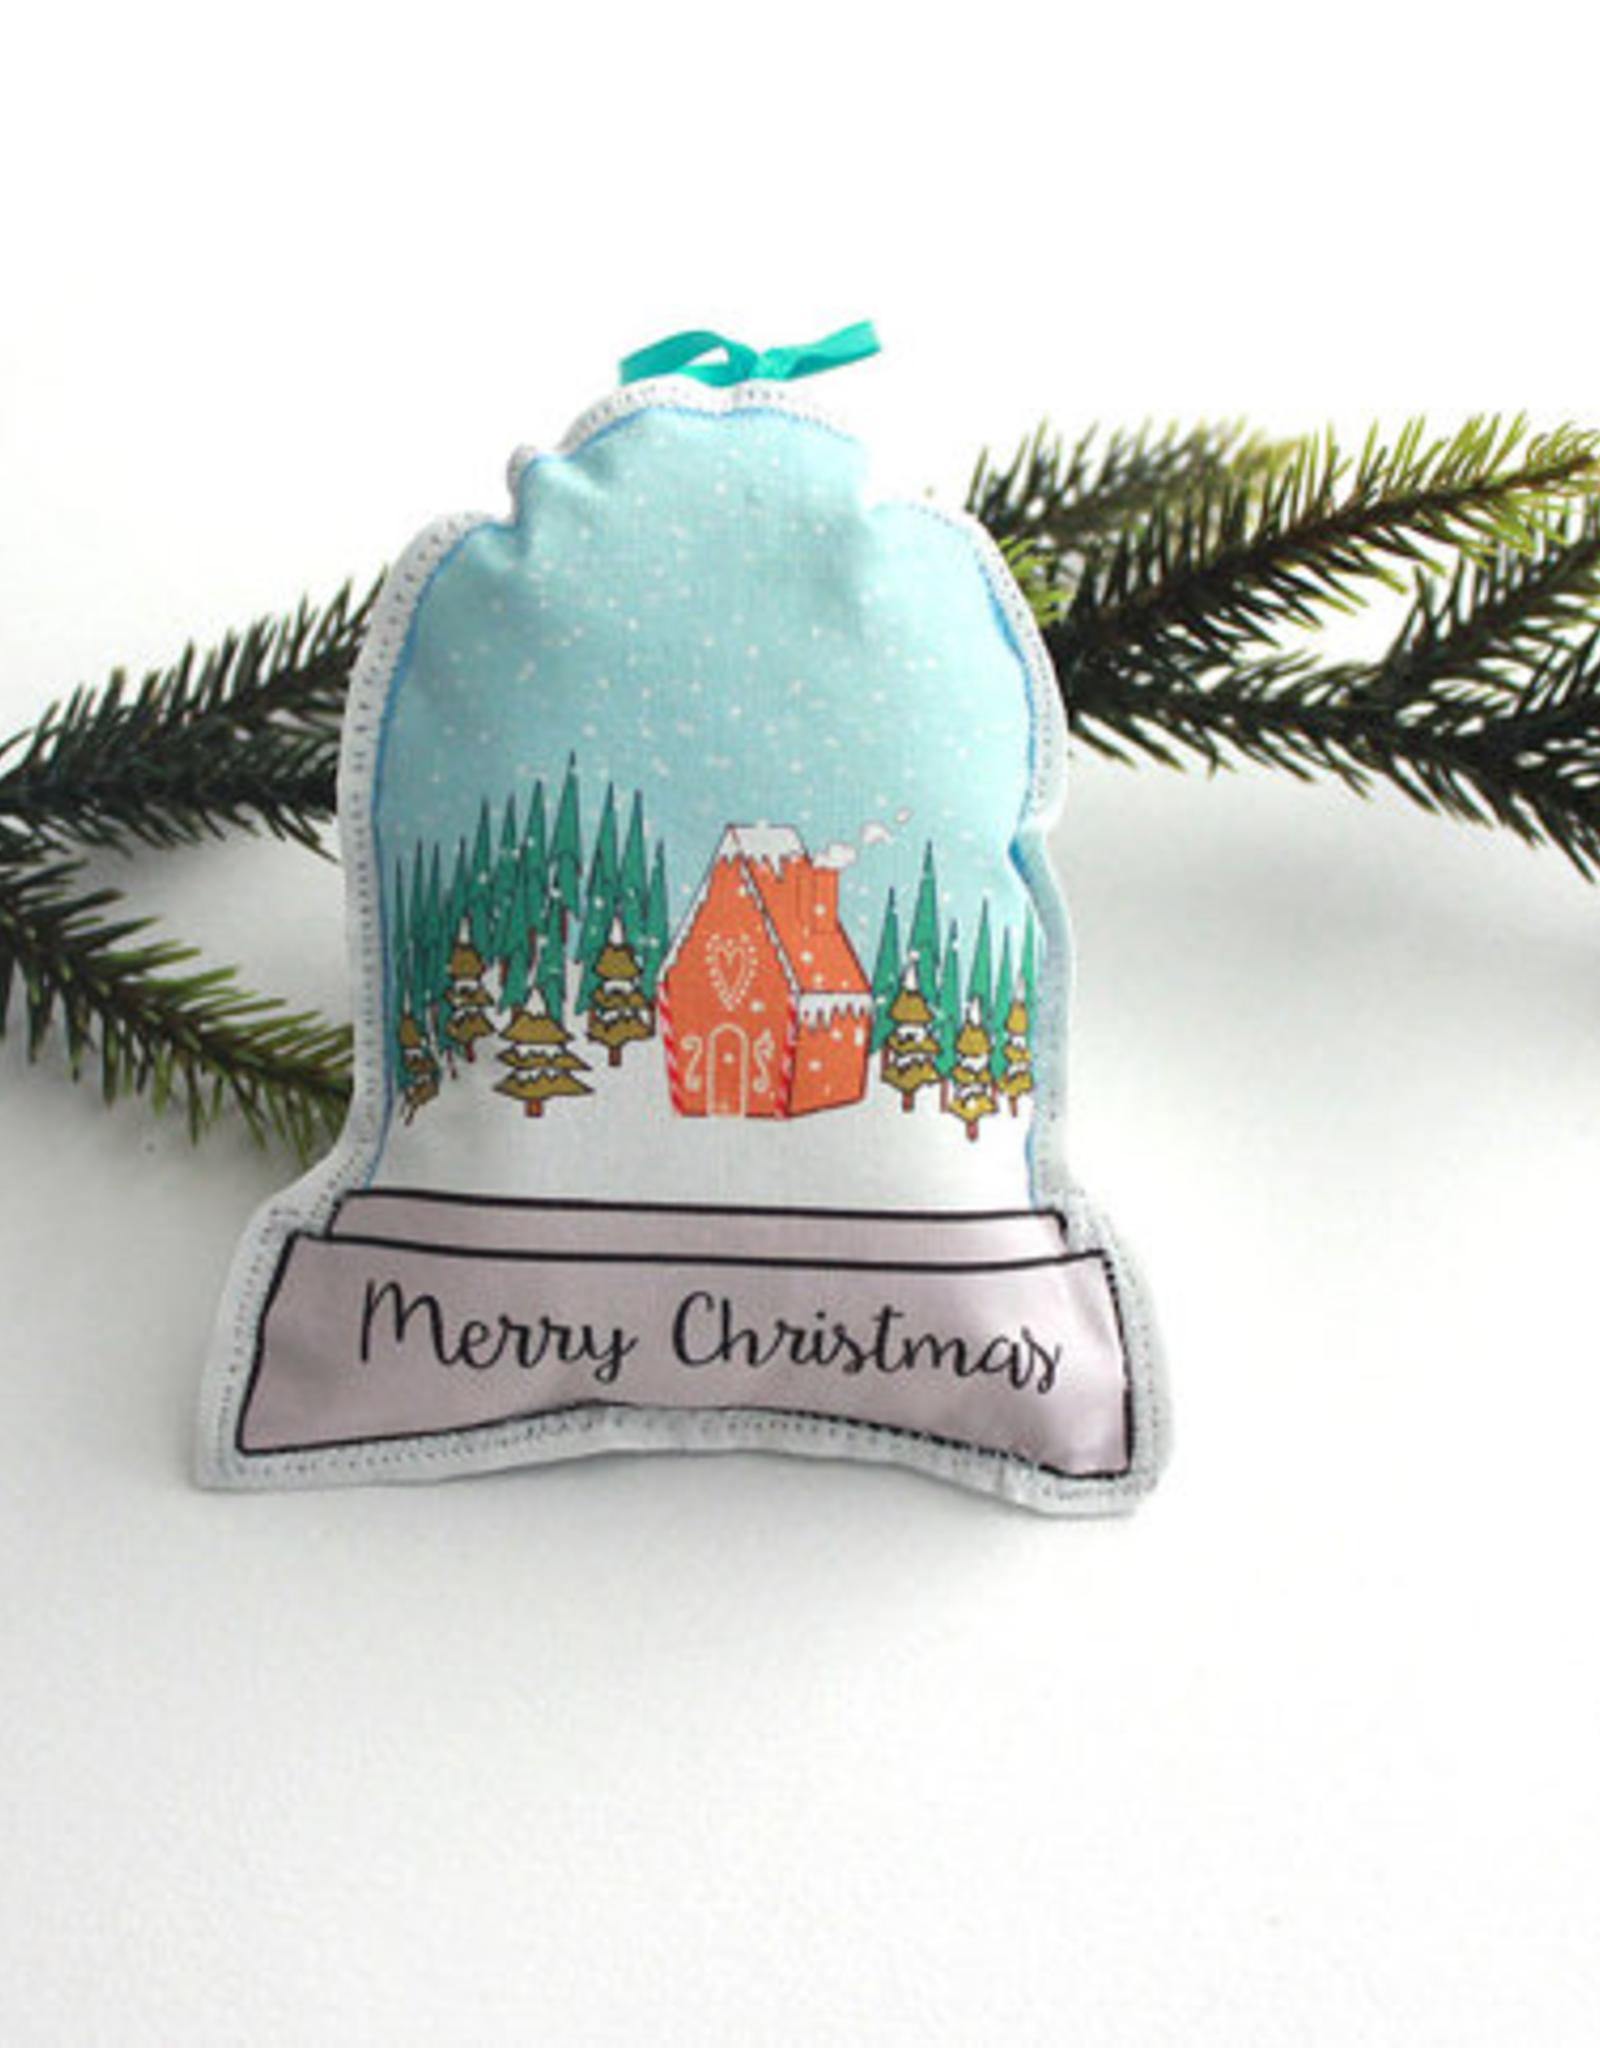 Snowglobe Ornament Assorted Single